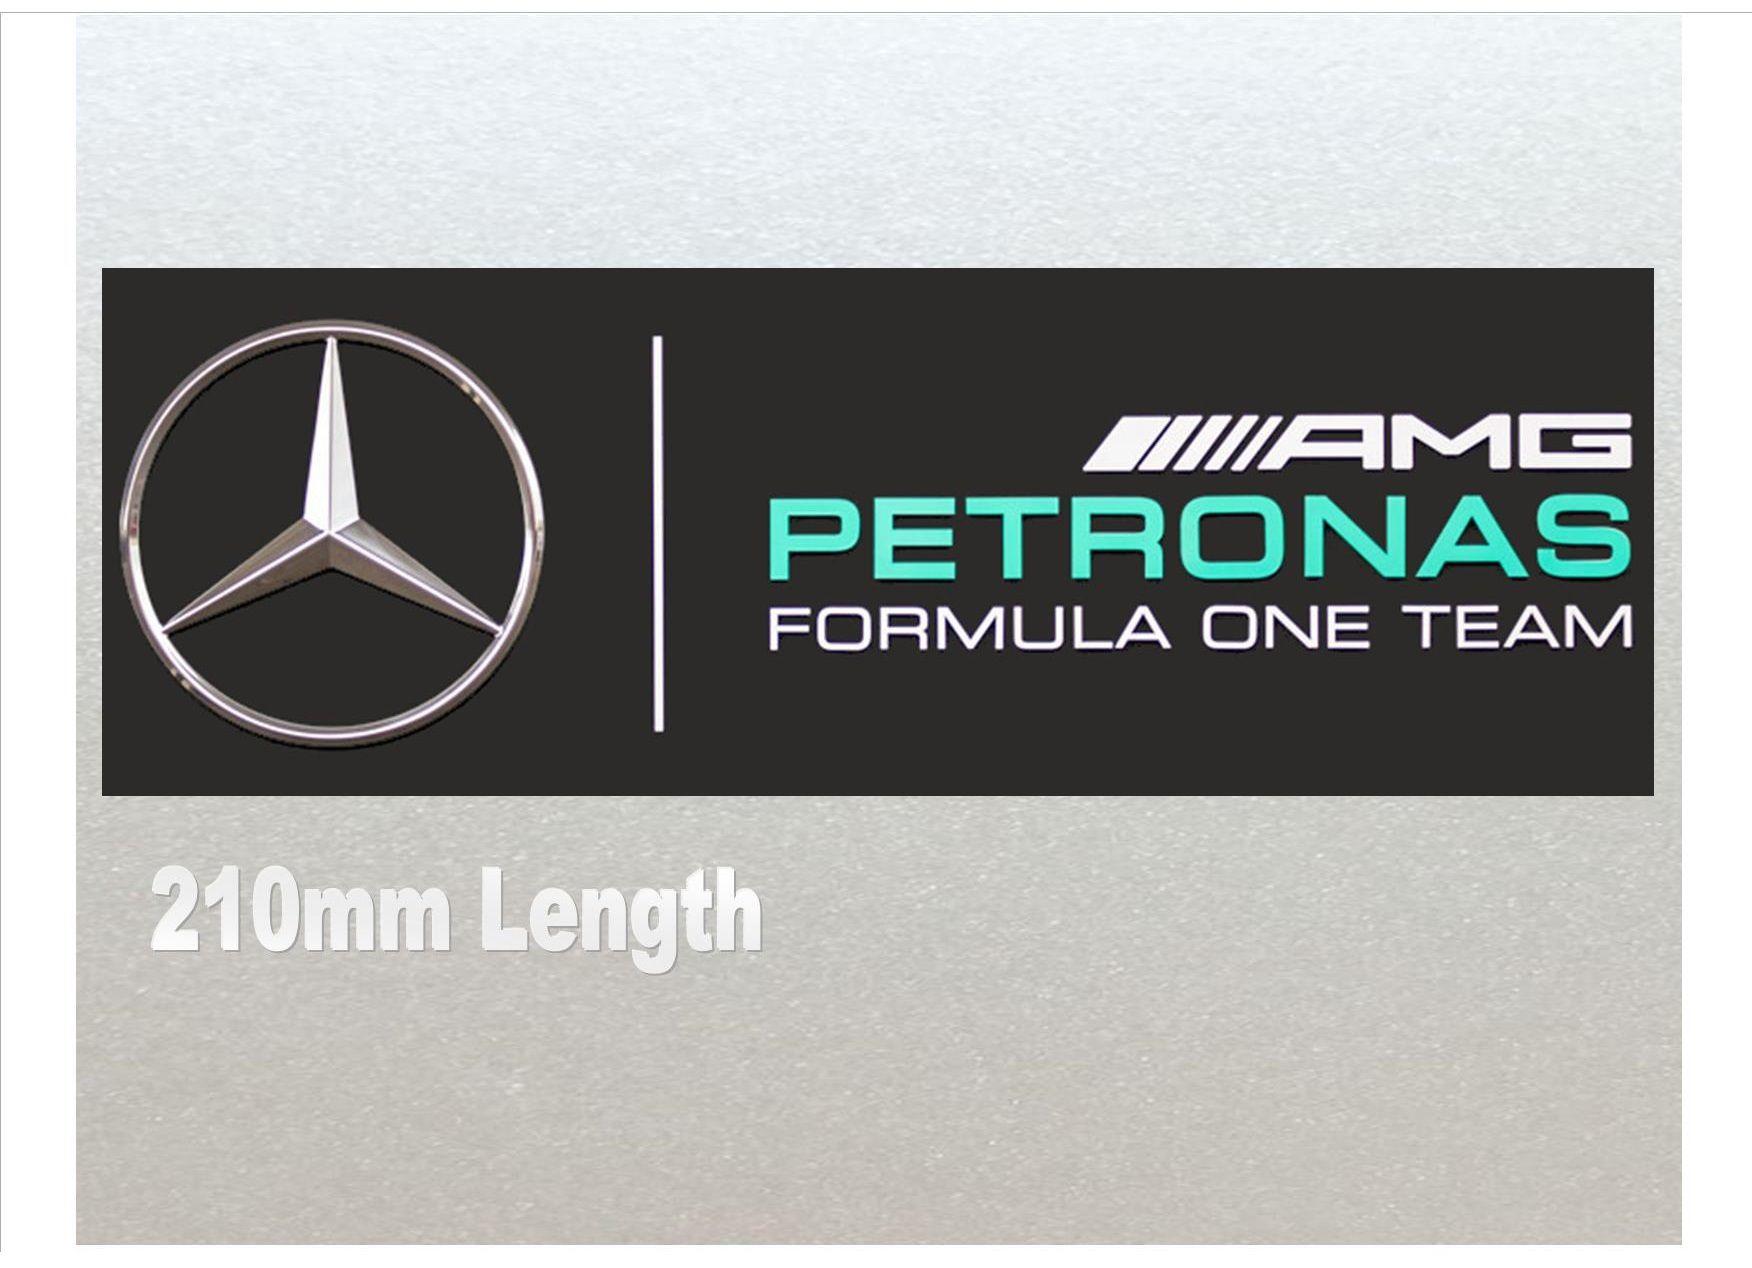 Xtra Large Mercedes Petronas Formula One F1 Racing Car Van Rc Etc Sticker 210mm Length High Quality Laminated Vinyl Petronas Mercedes Formulas [ 1268 x 1752 Pixel ]